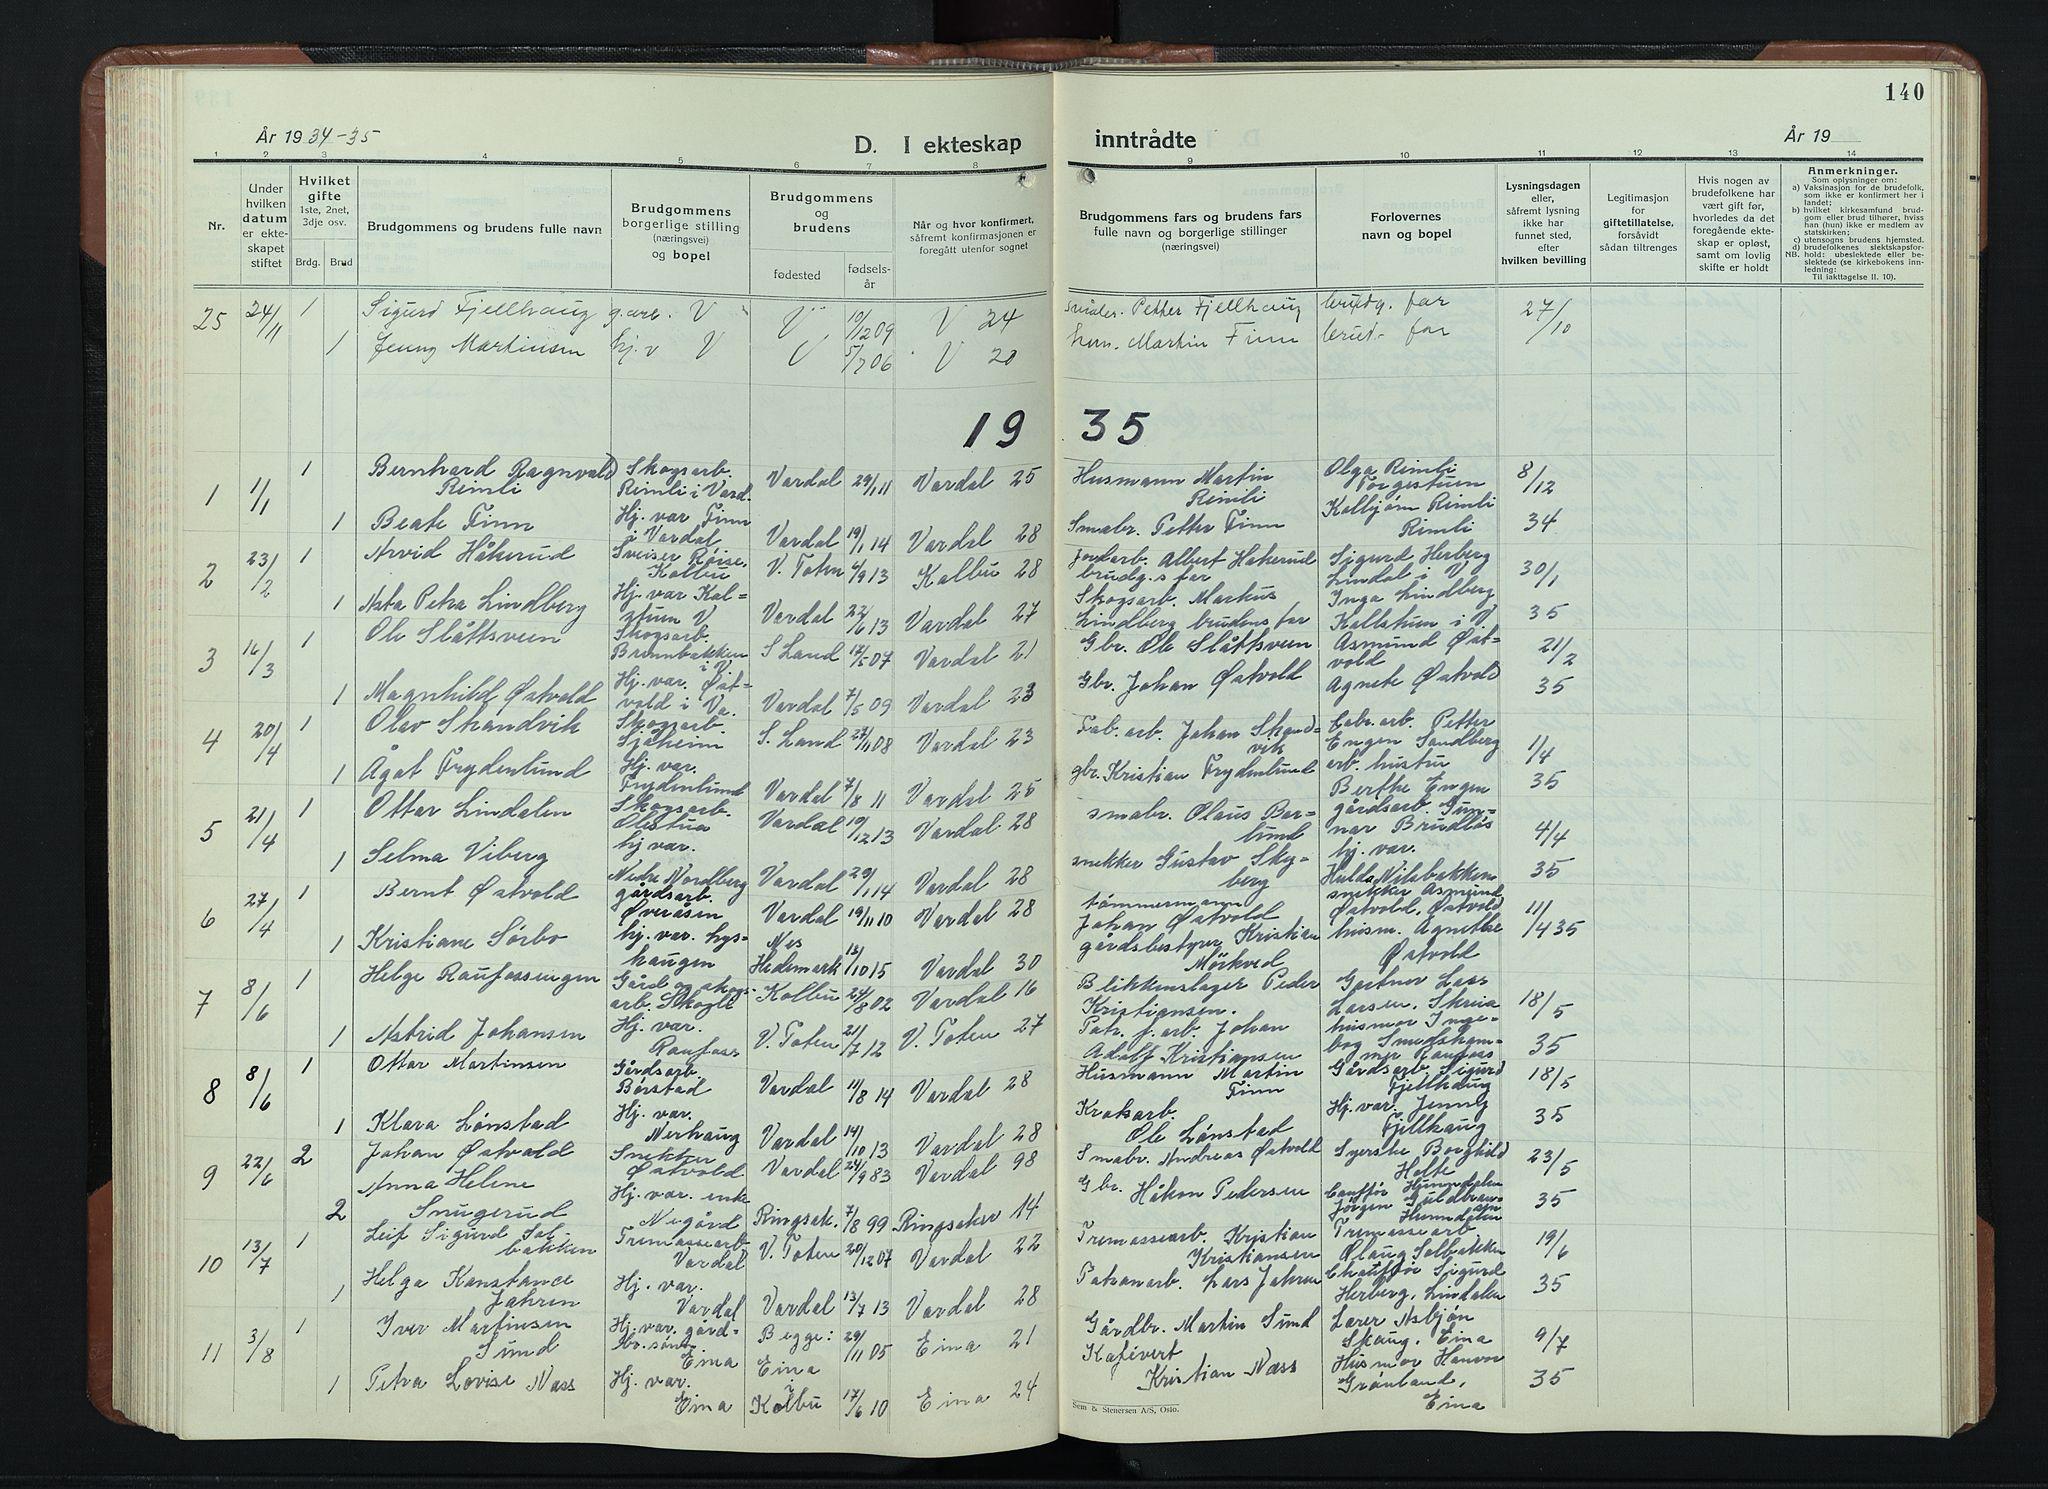 SAH, Vardal prestekontor, H/Ha/Hab/L0018: Klokkerbok nr. 18, 1931-1951, s. 140